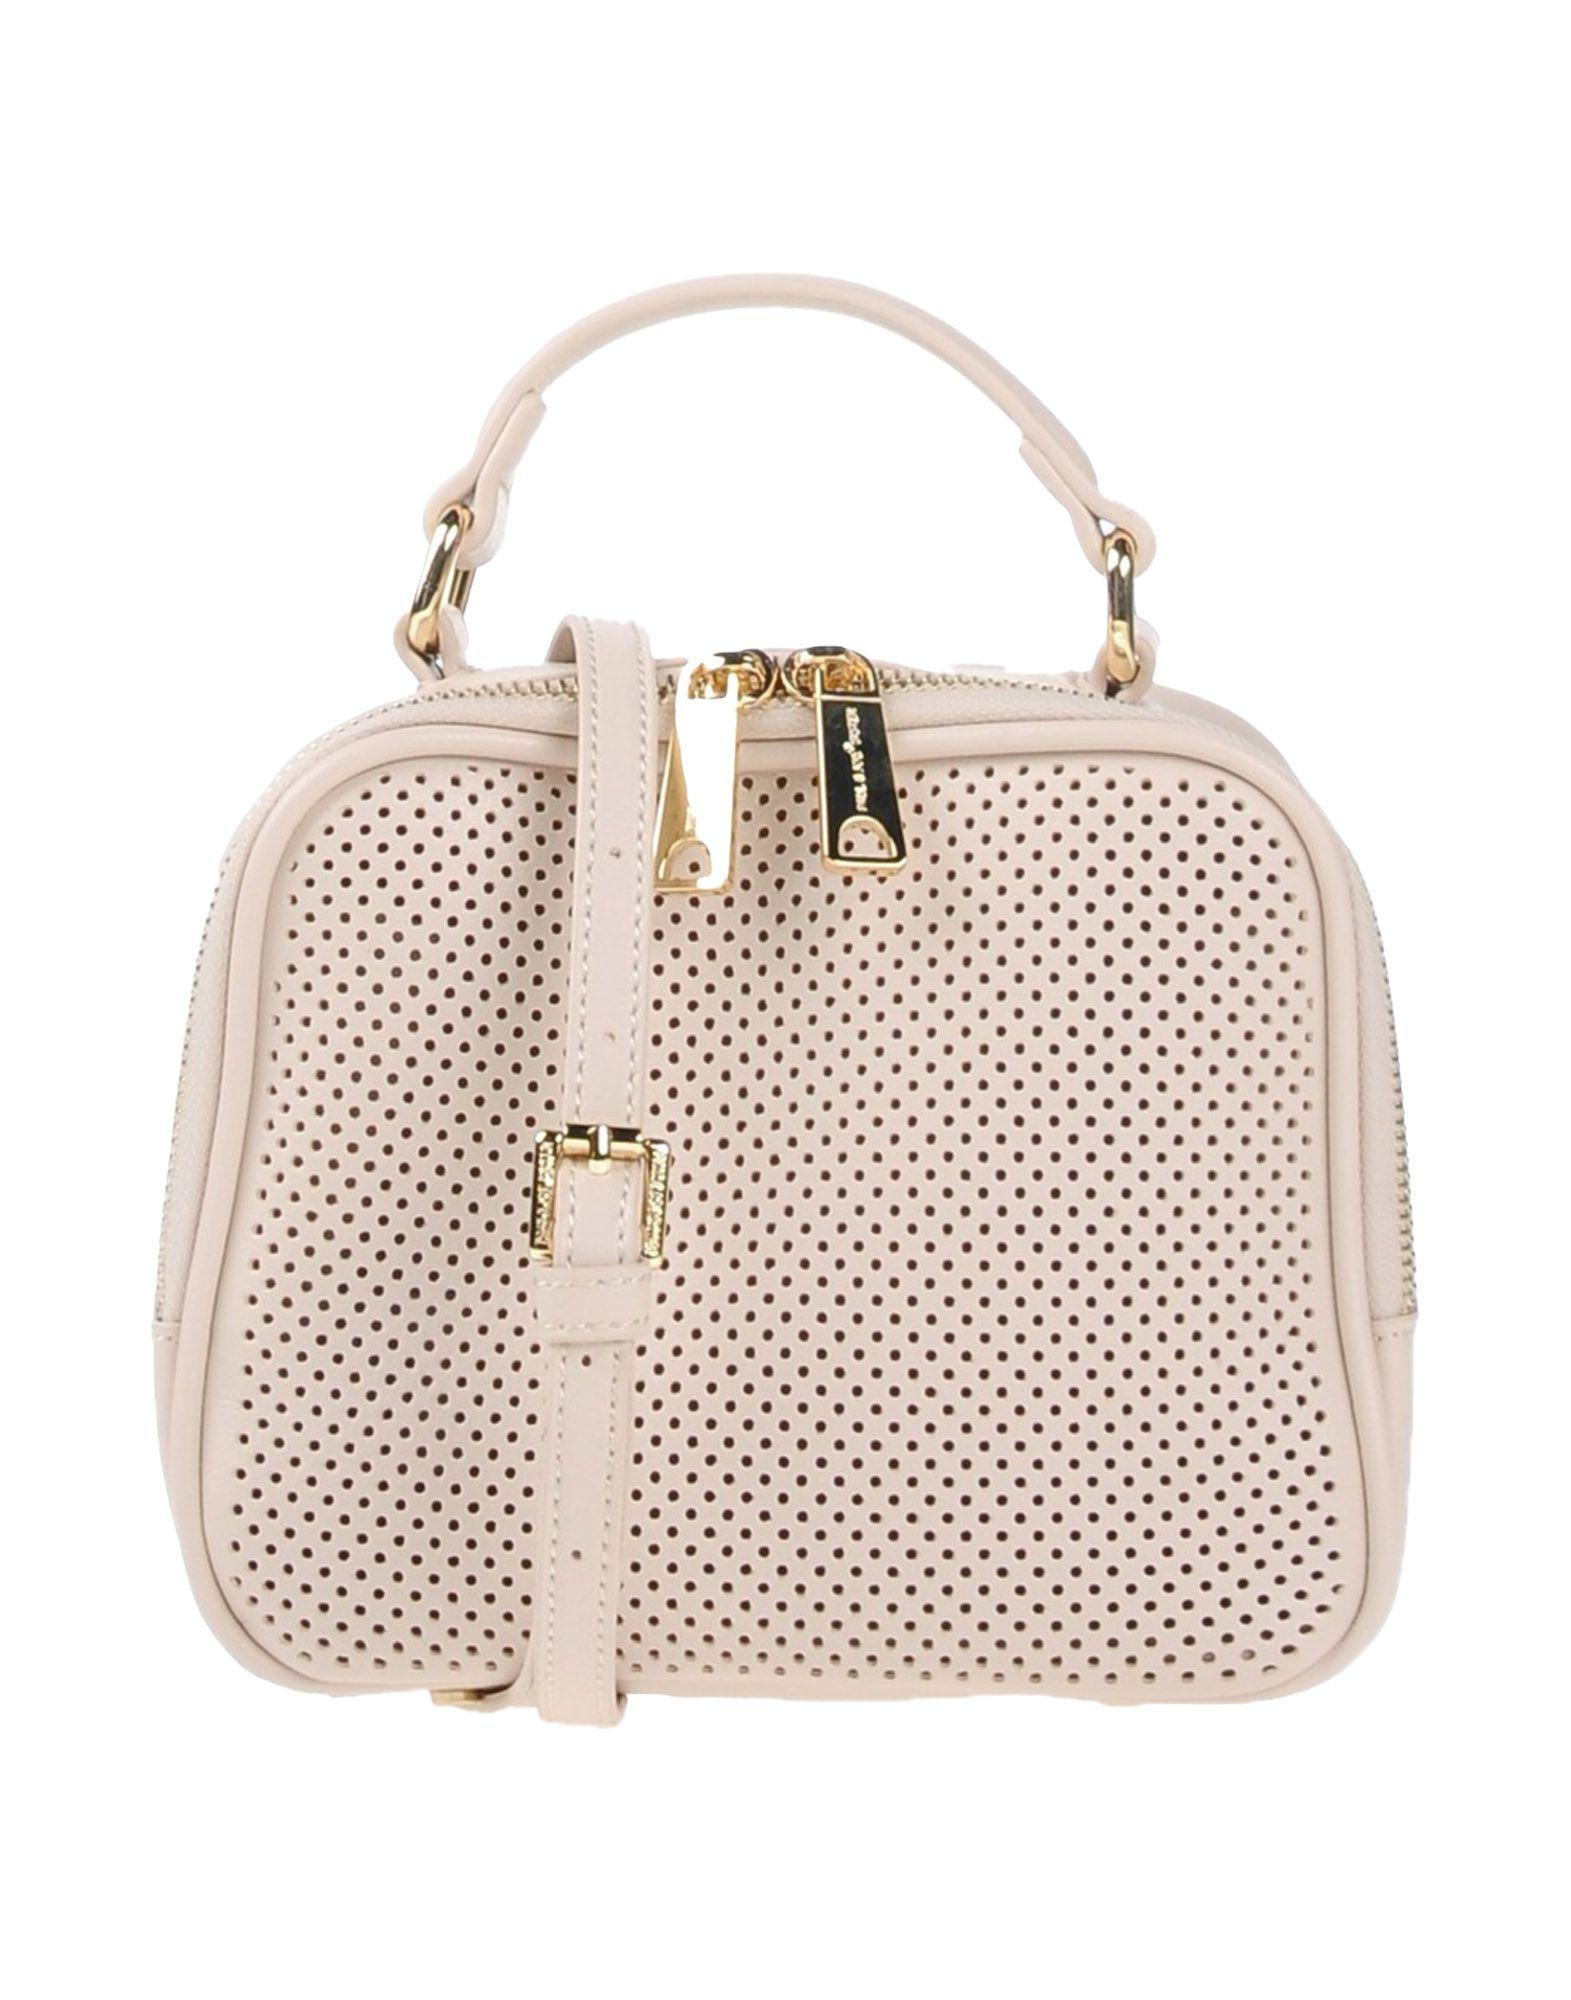 Paul & joe Handbag in Natural